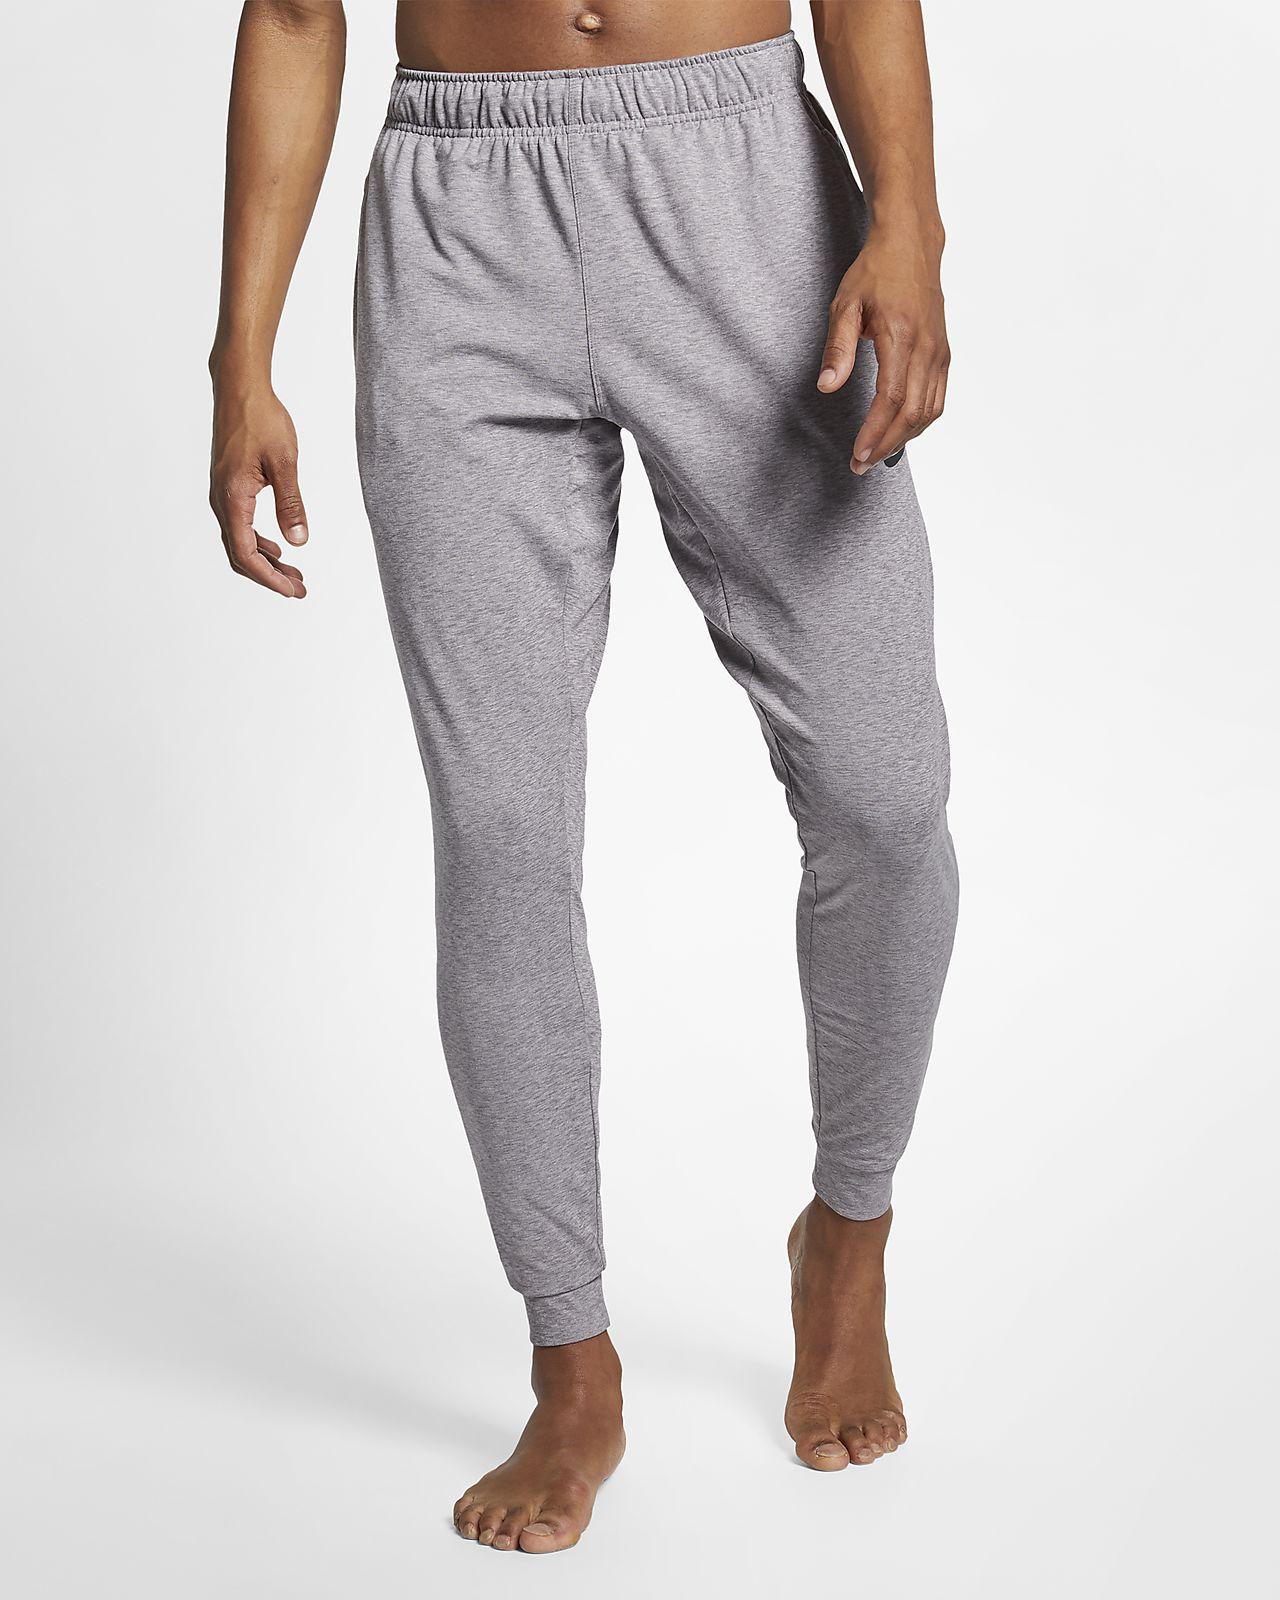 Pantalon de yoga Nike Dri-FIT pour Homme